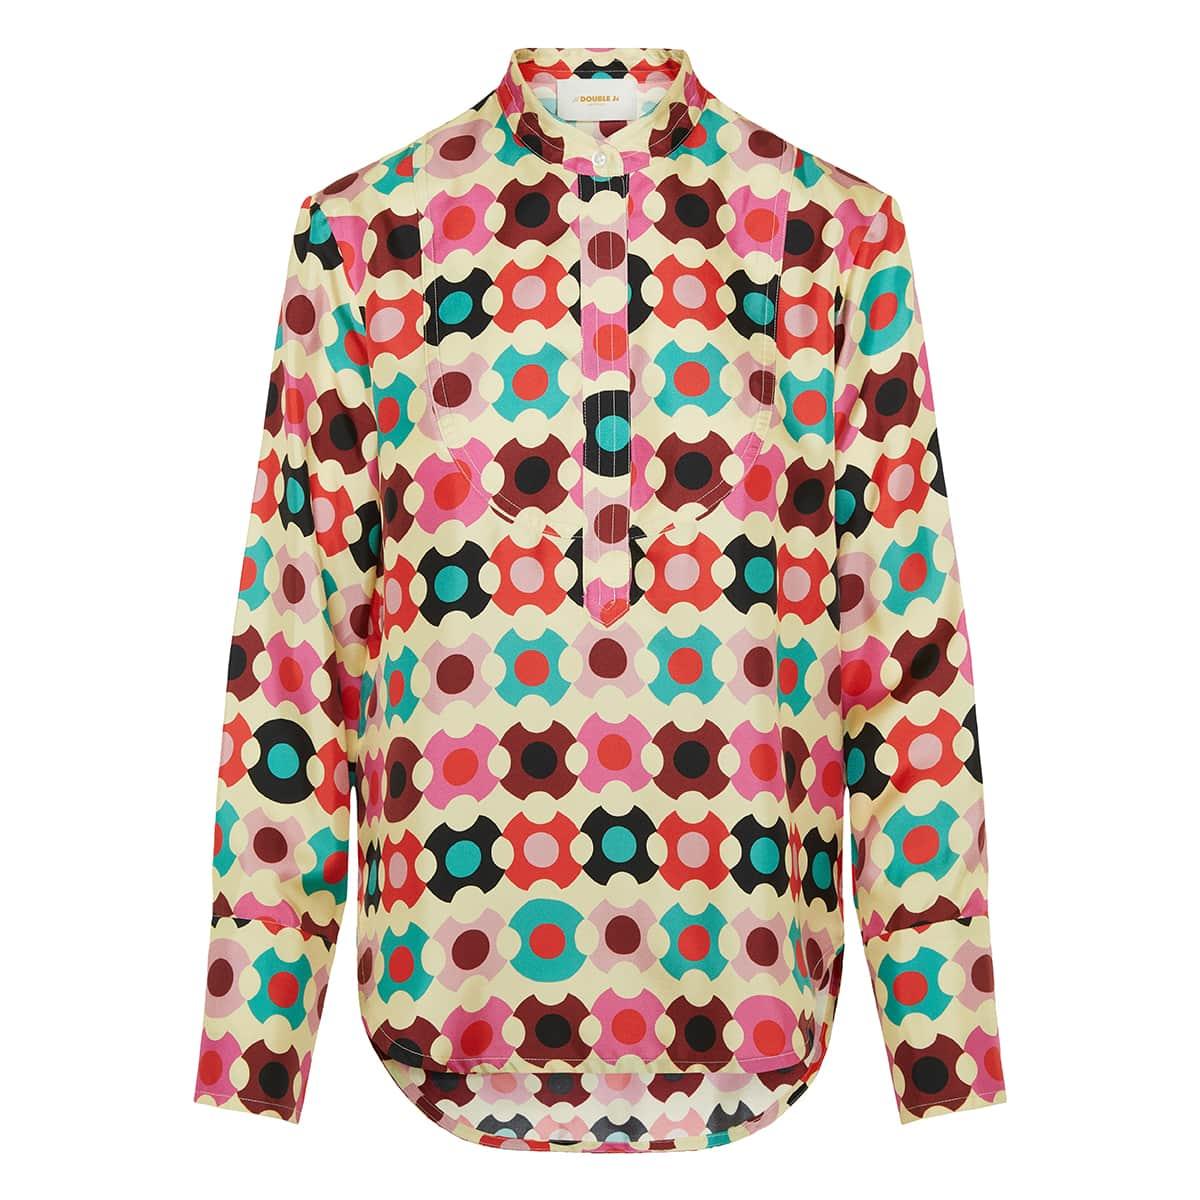 Portofino printed shirt